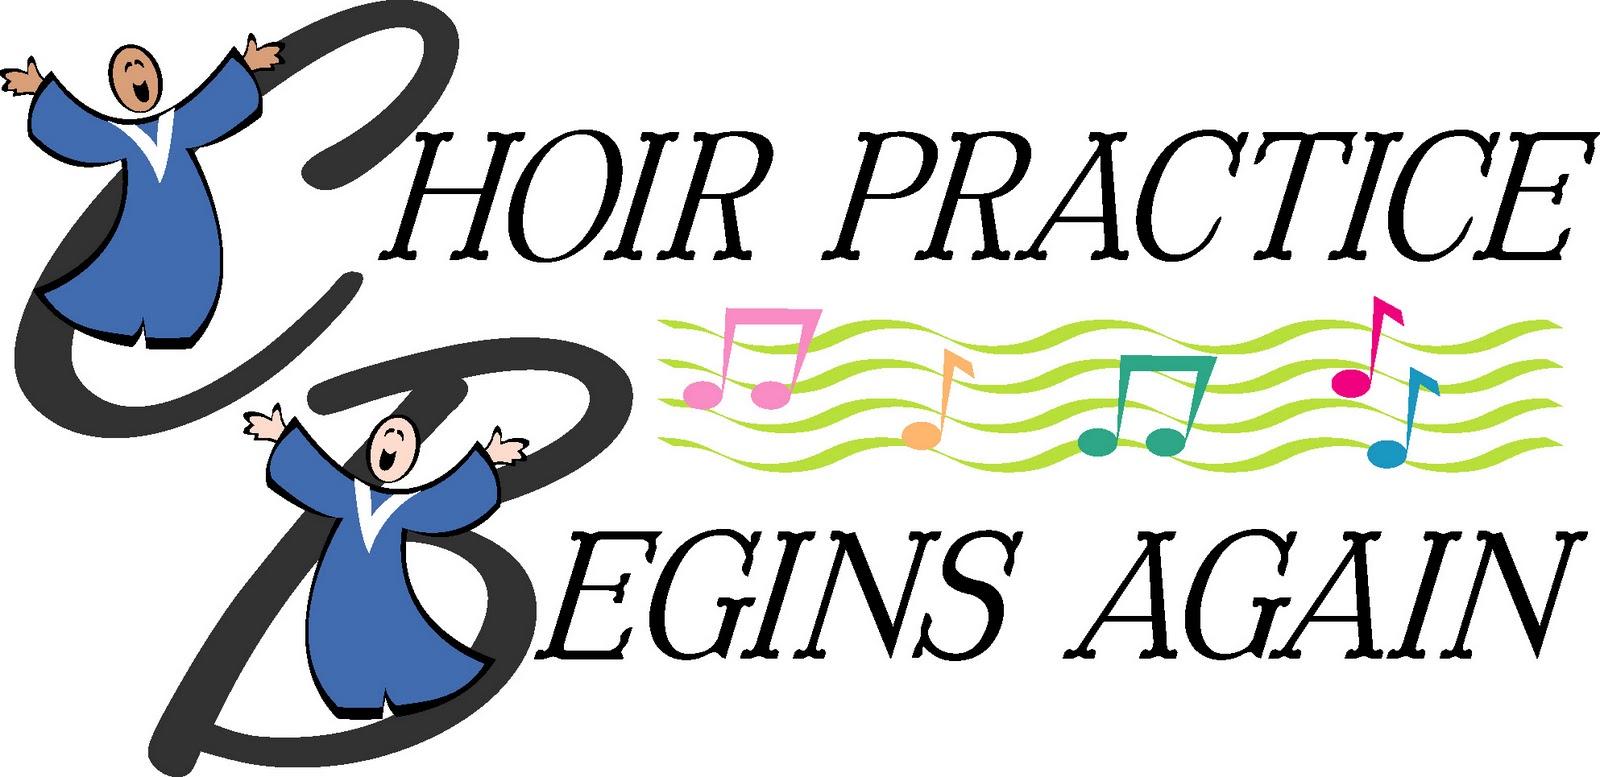 Christmas free download best. Choir clipart choir practice